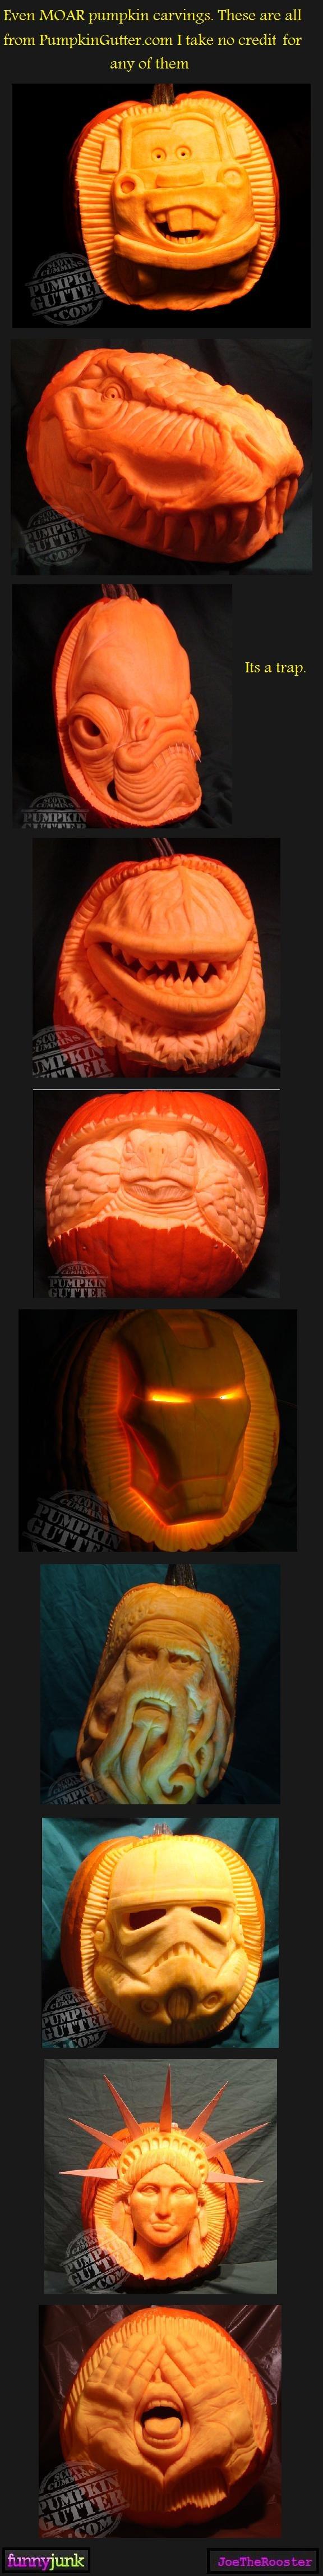 Pumpkin carvings 3. Moar<br /> Pumpkin carvings 3 Moar<br />